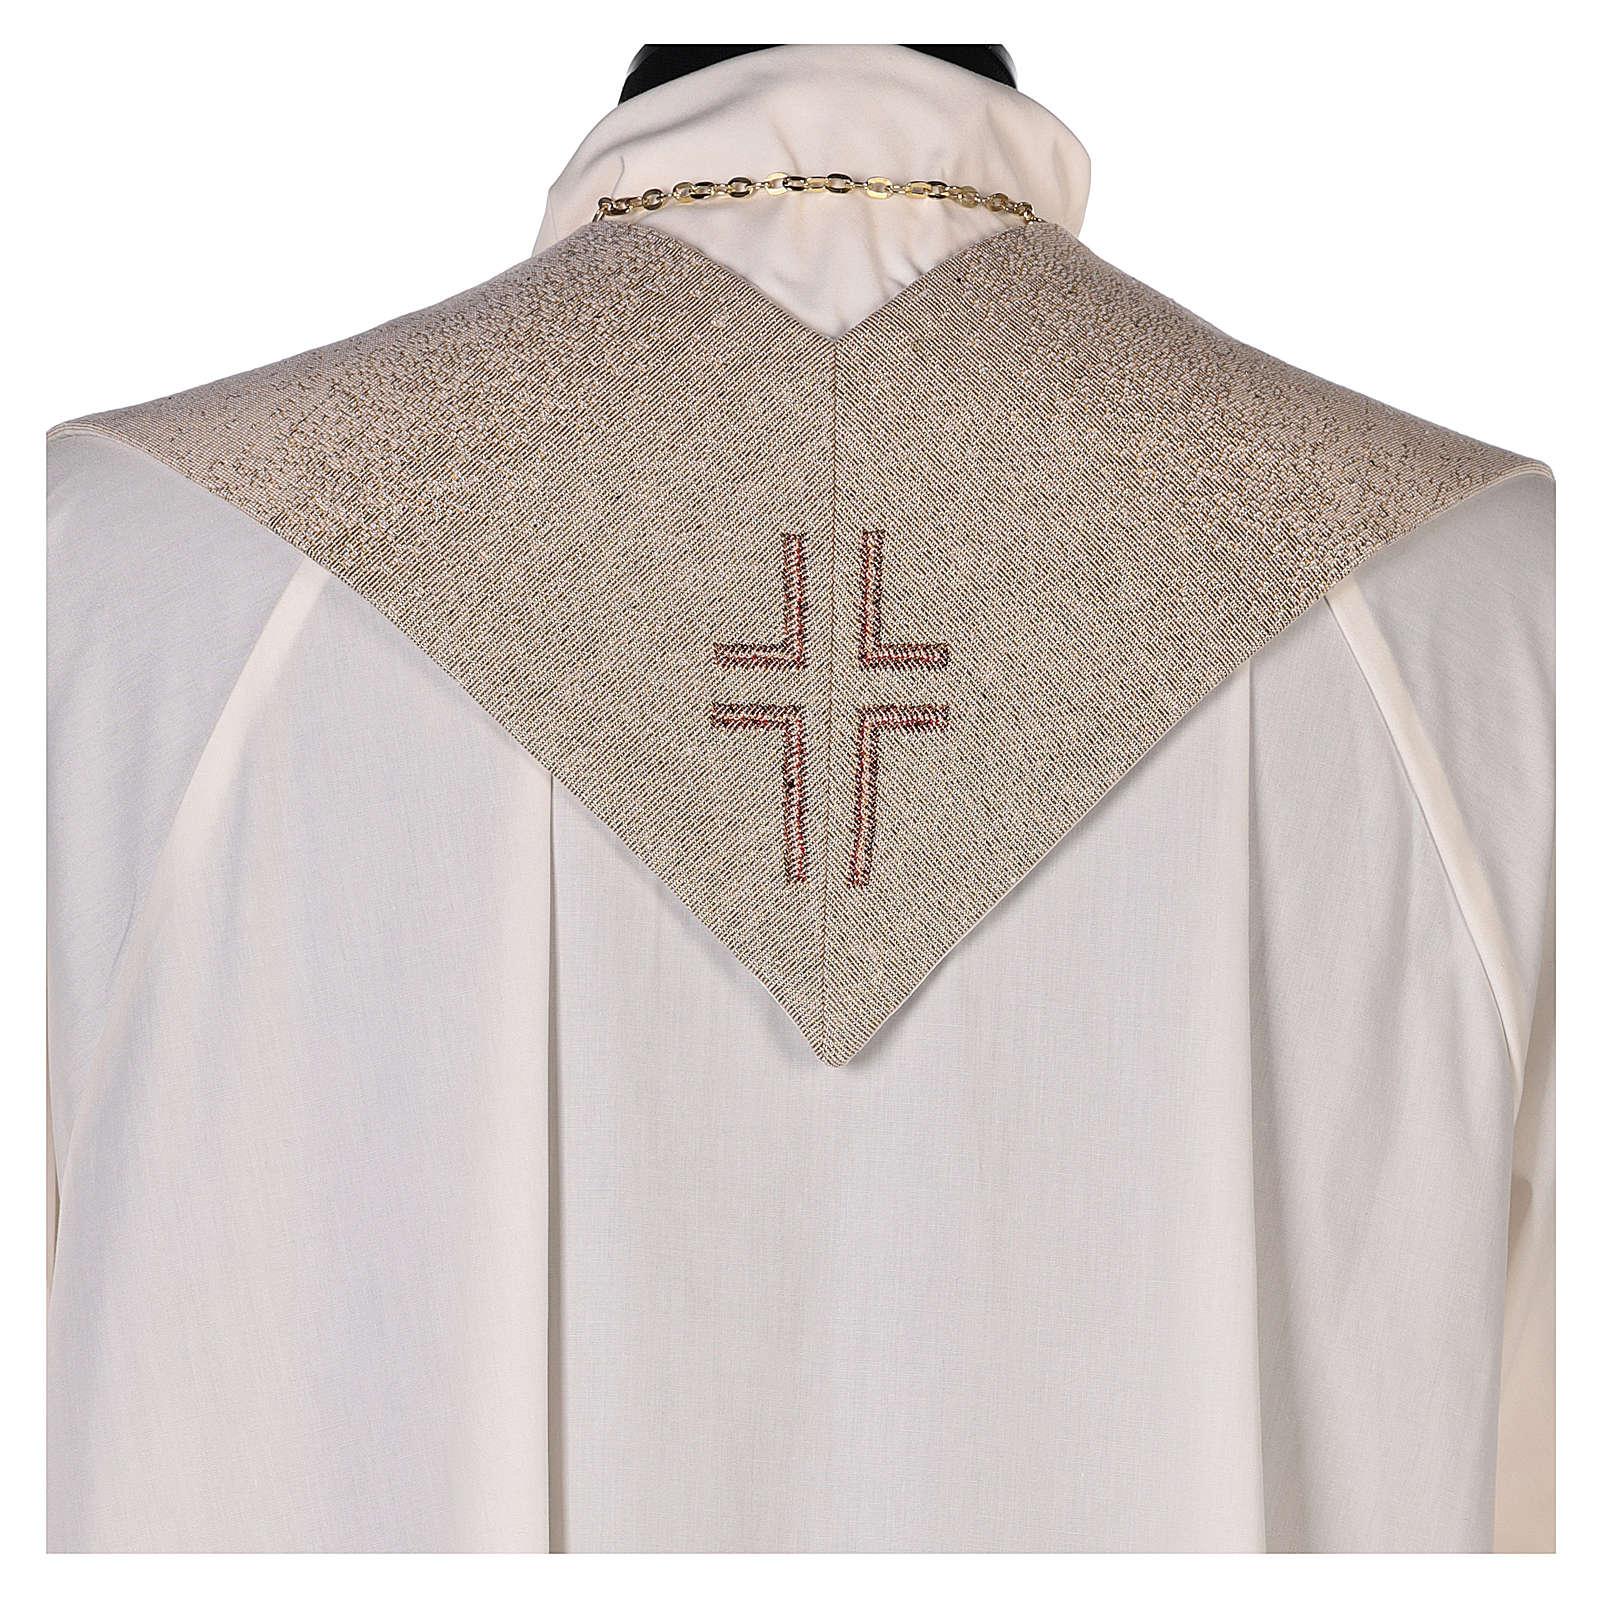 Stola Madonna Buon Consiglio simbolo mariano avorio 4